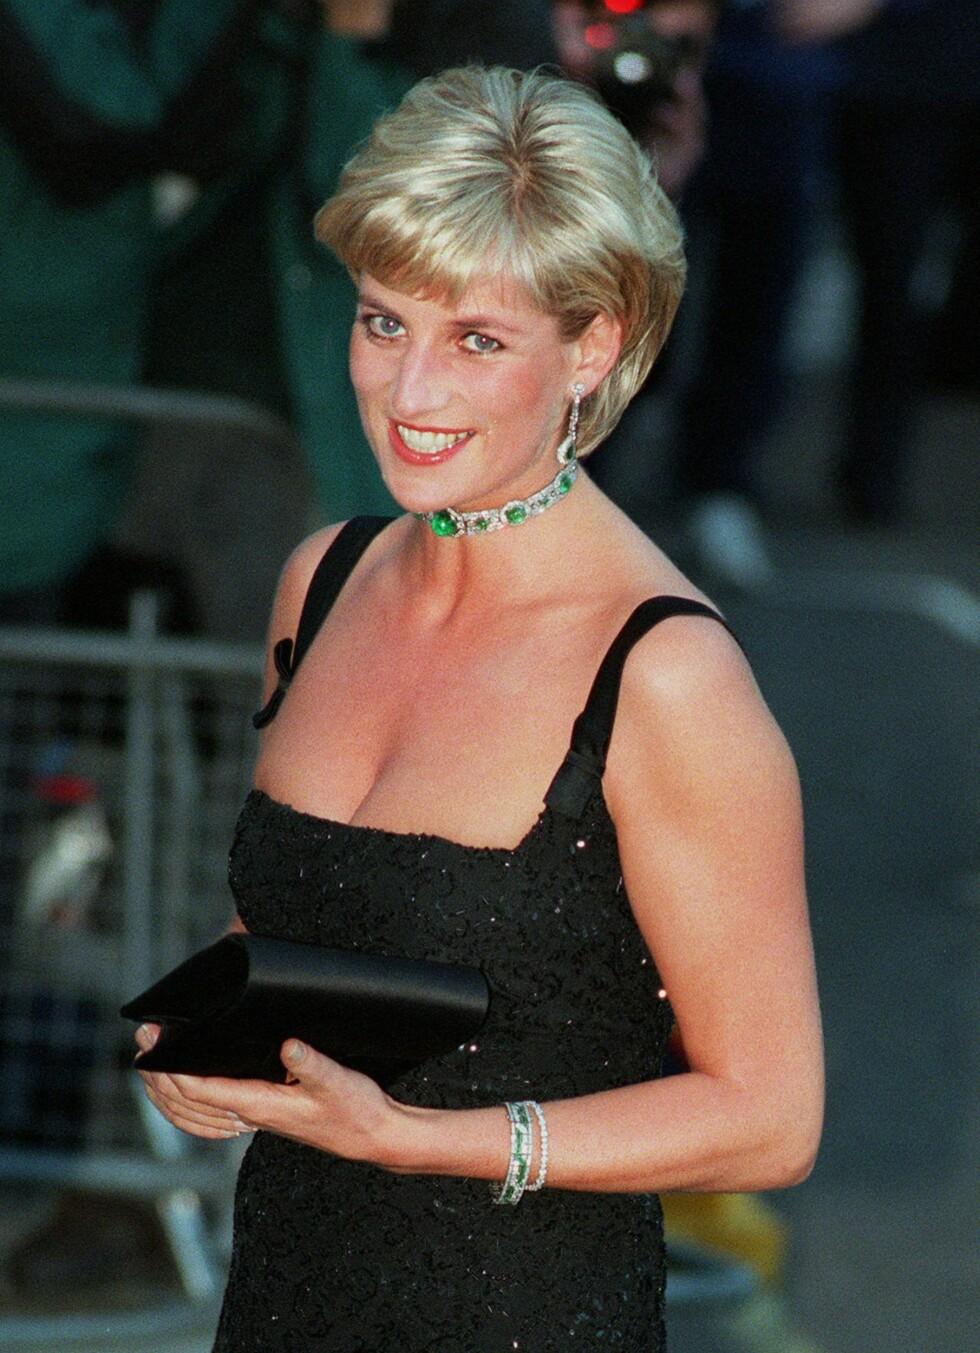 DEN LILLE SORTE: Diana fotografert under en tilstelning på Tate Gallery i London på sin egen 36-årsdag. Foto: NTB Scanpix